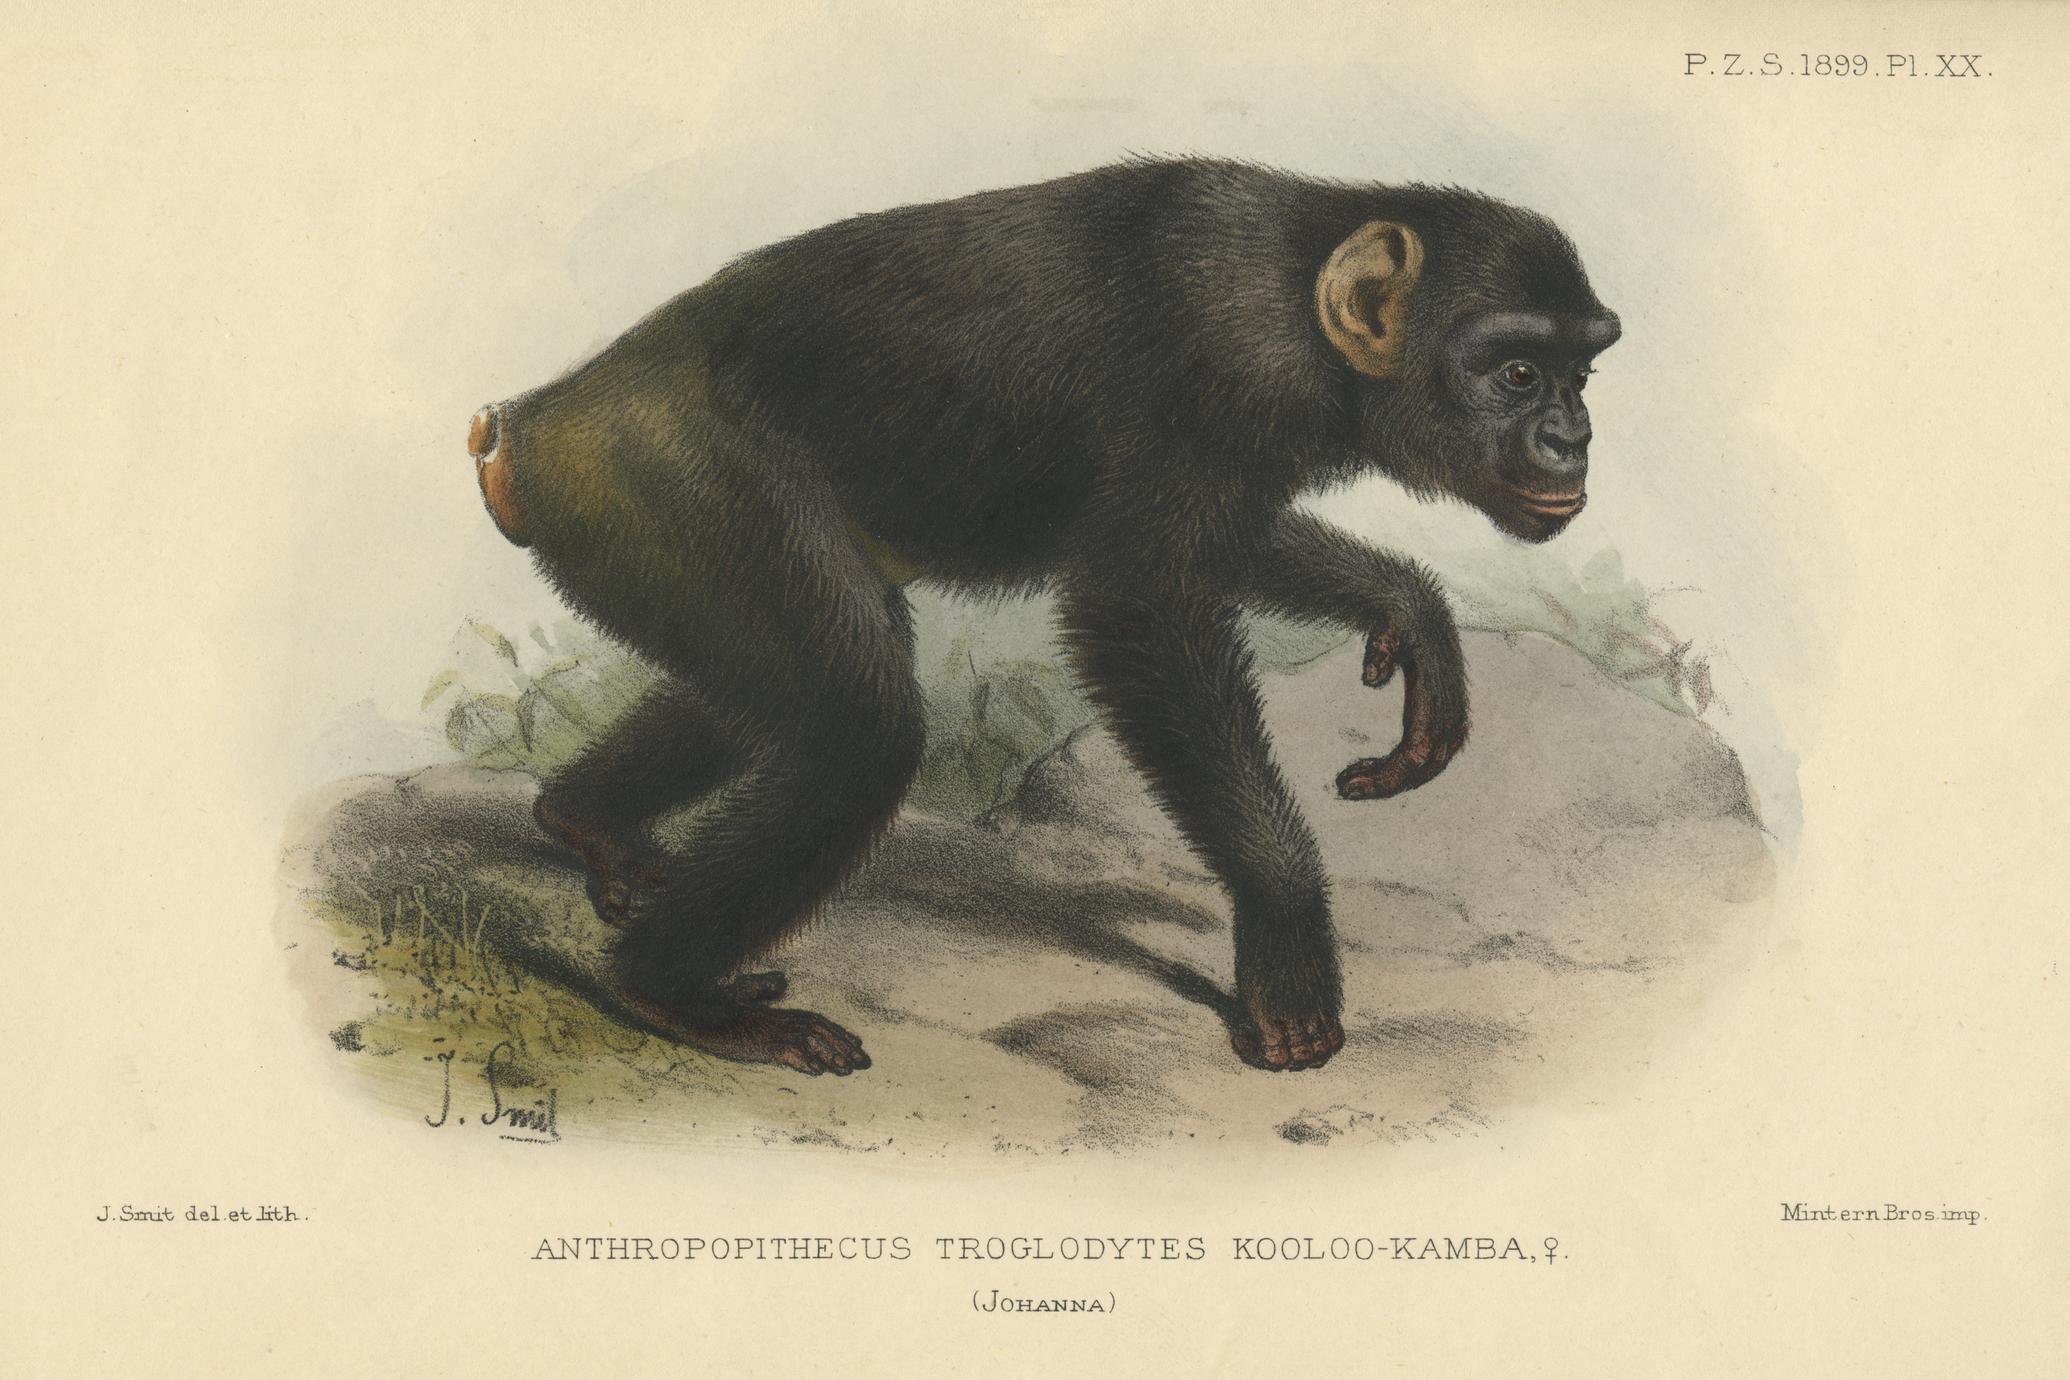 Anthropopithecus Troglodytes Kooloo-Kamba